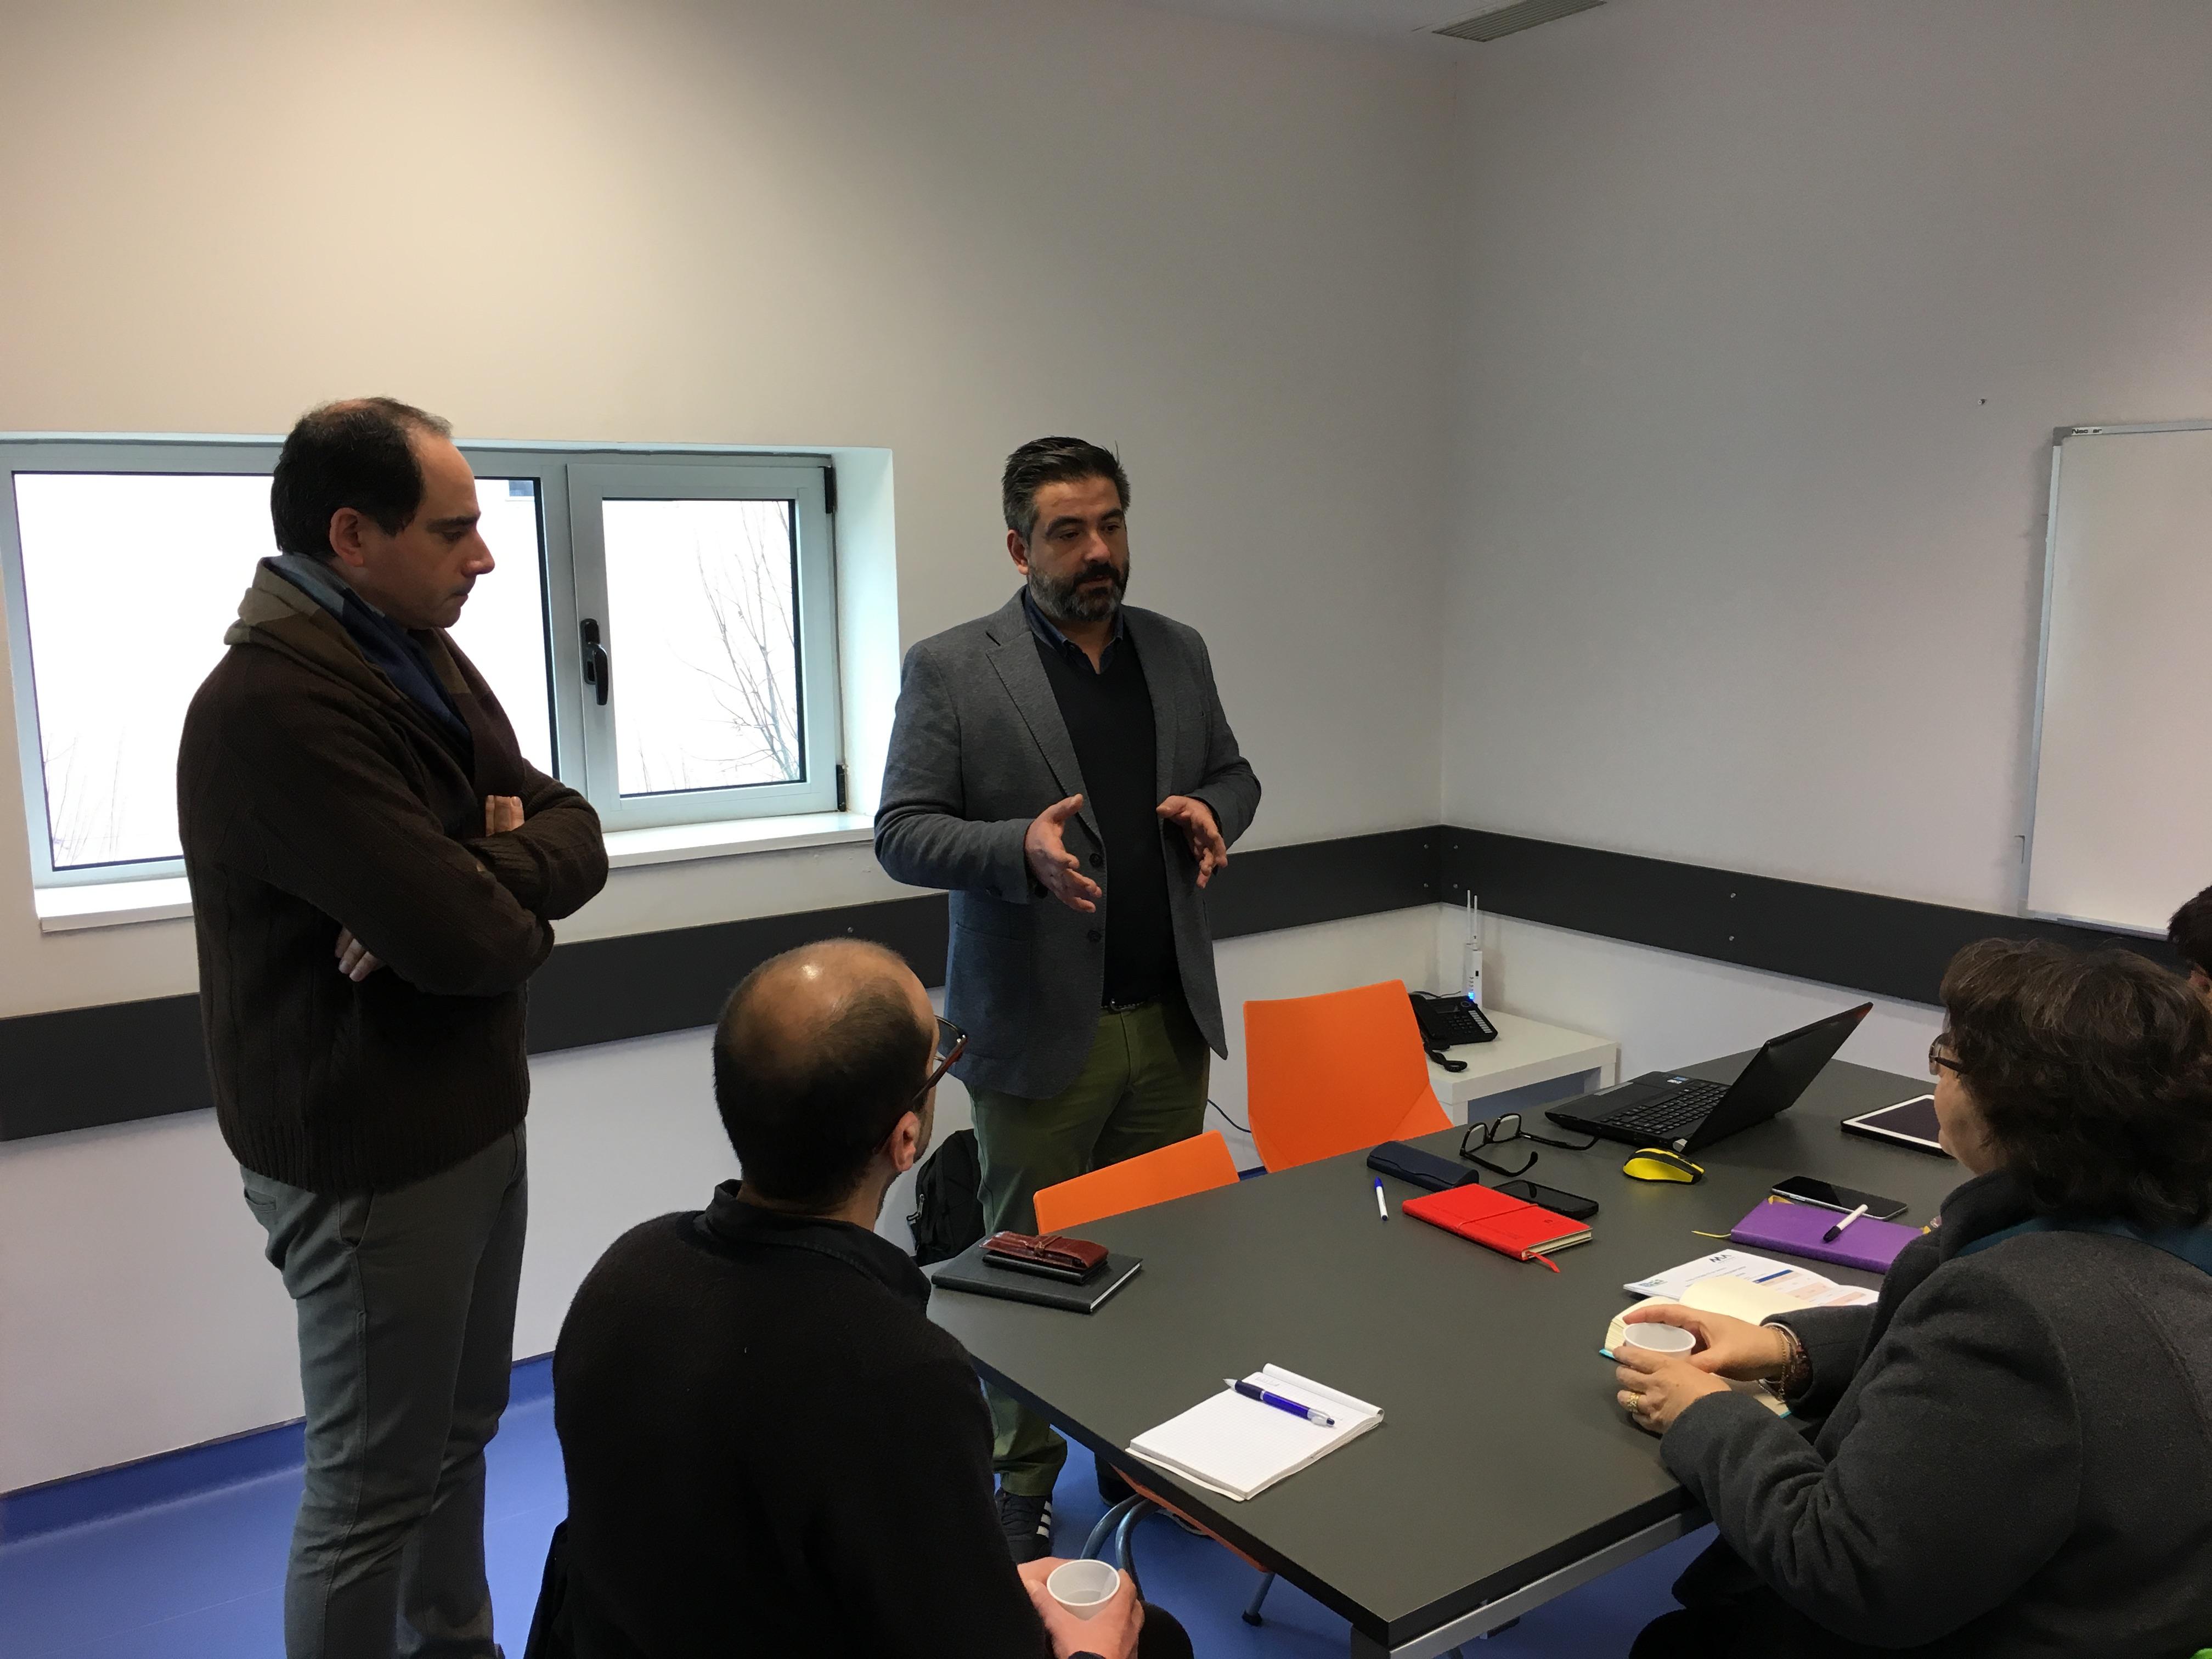 SPMS visita SCMA no âmbito do projeto ProEmpower